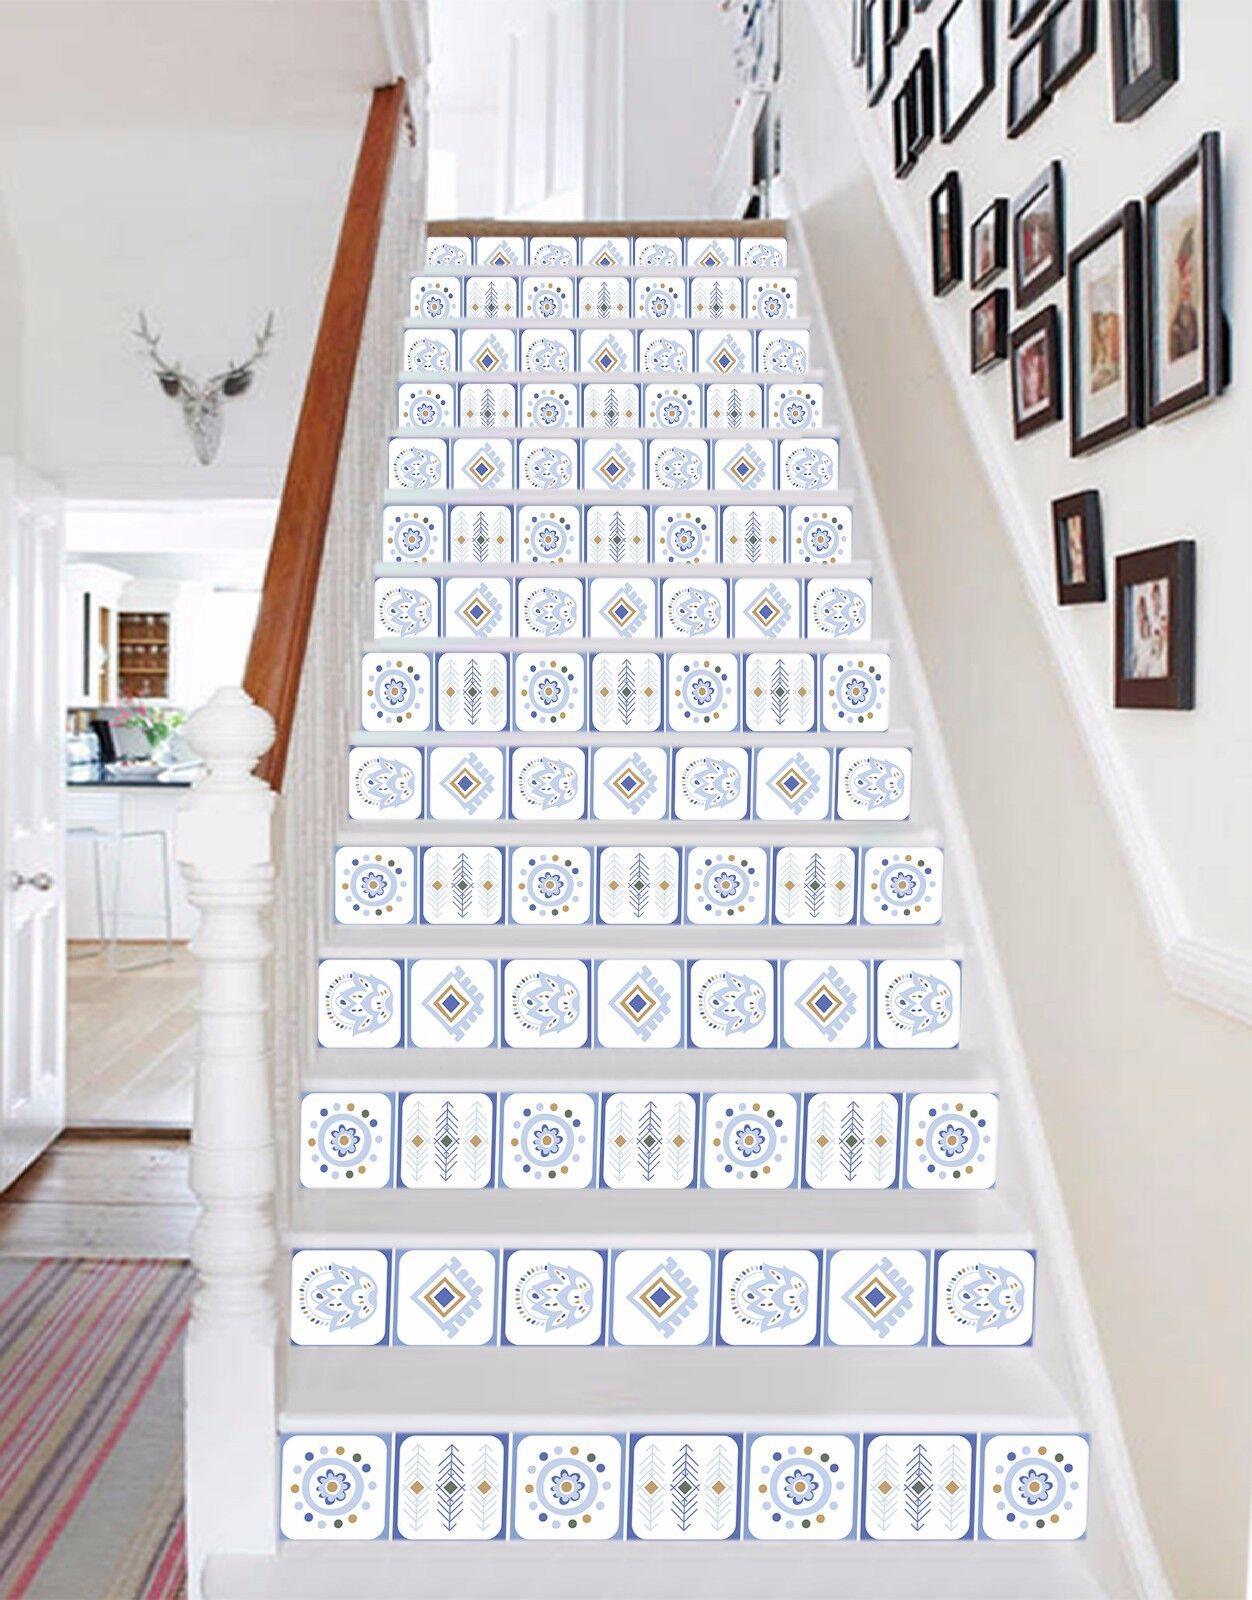 3D Weiß 402 Stair Risers Dekoration Fototapete Vinyl Aufkleber Tapete DE Lemon